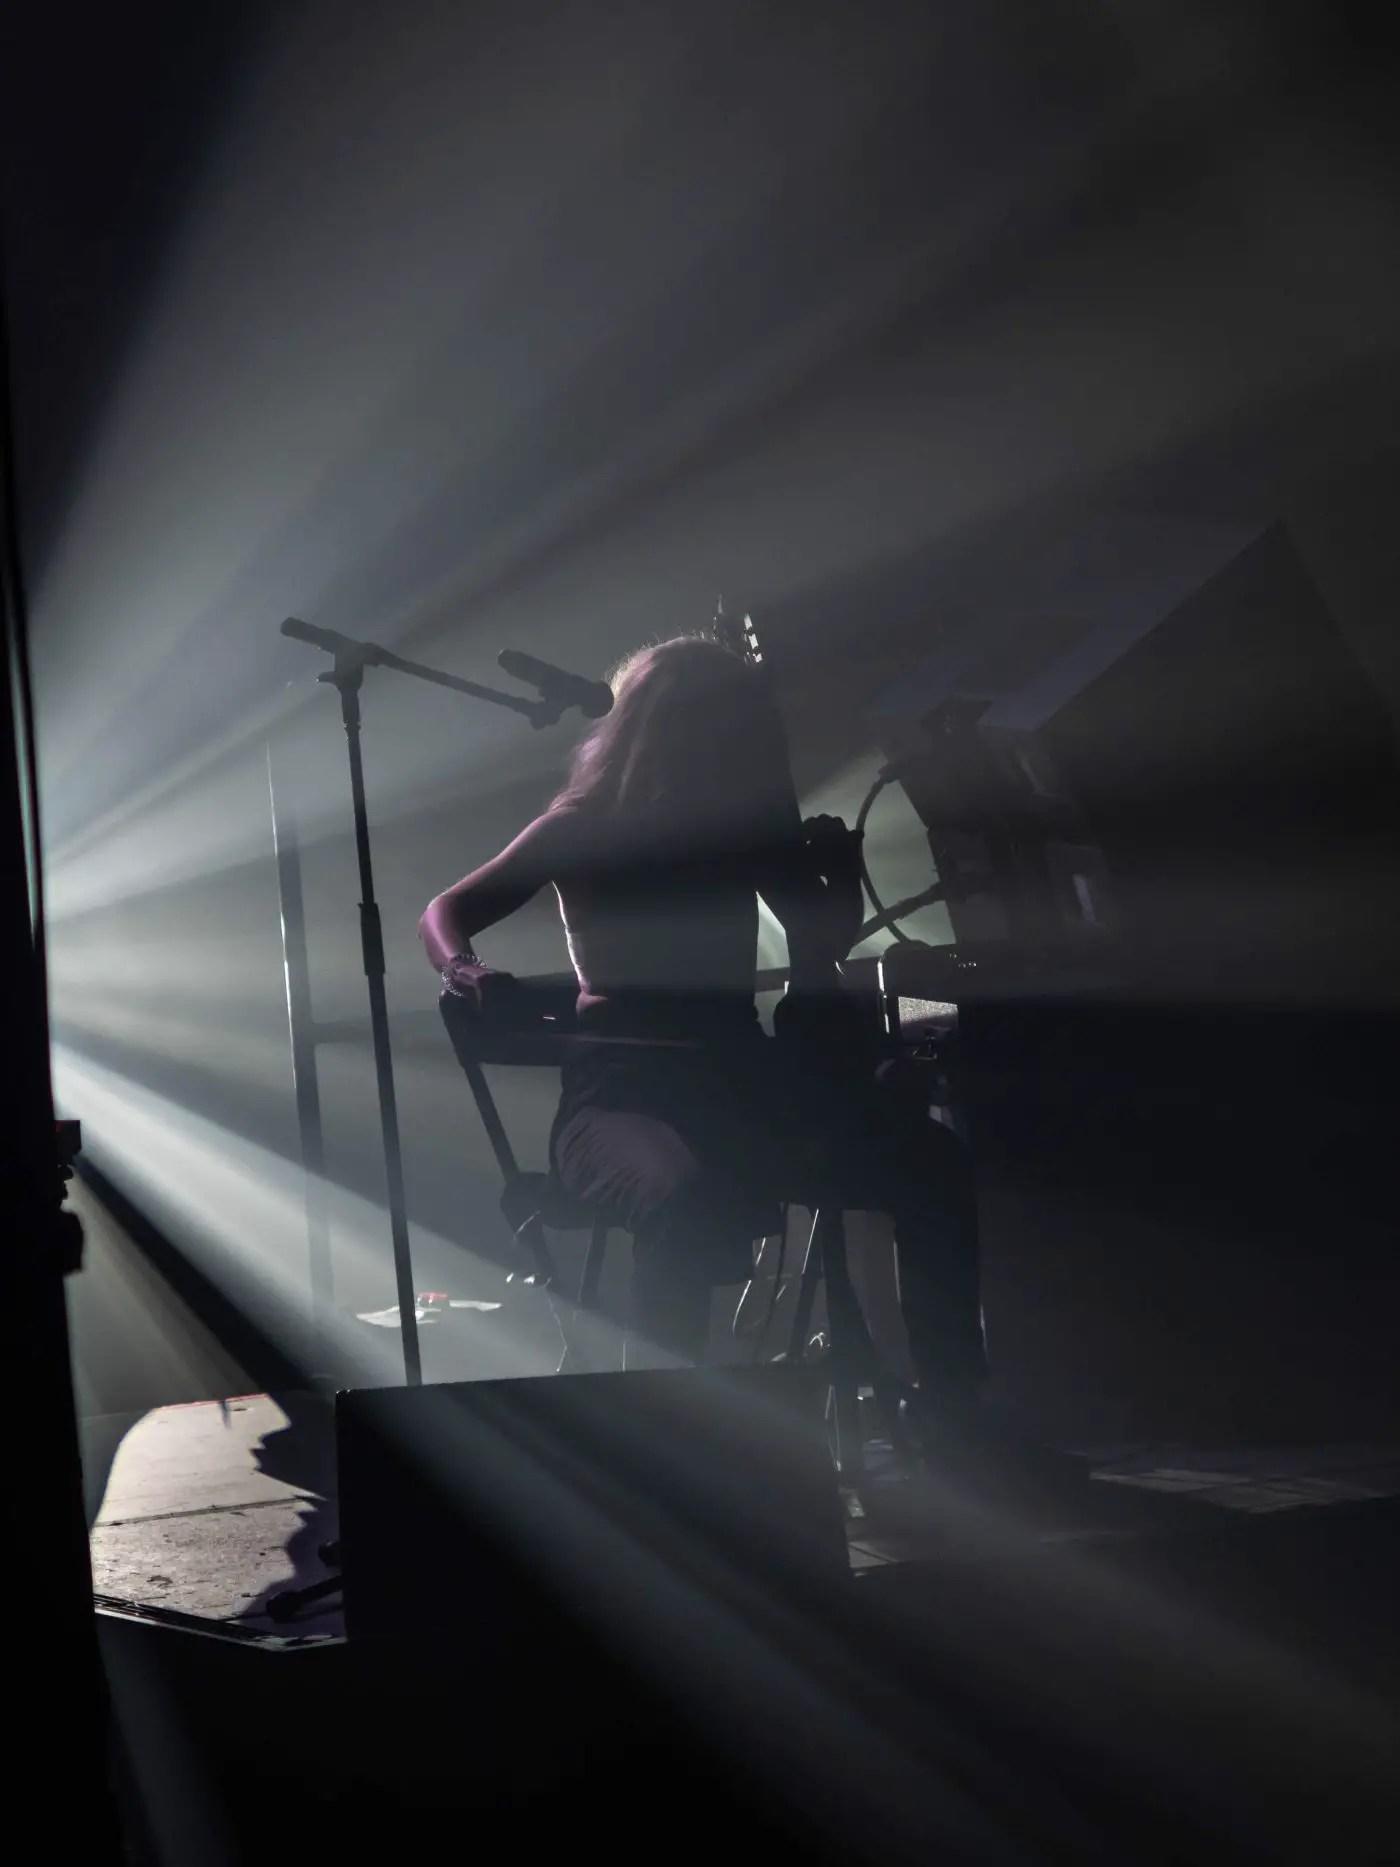 Alison Wonderland : Echostage | Photos | LIVING LIFE FEARLESS